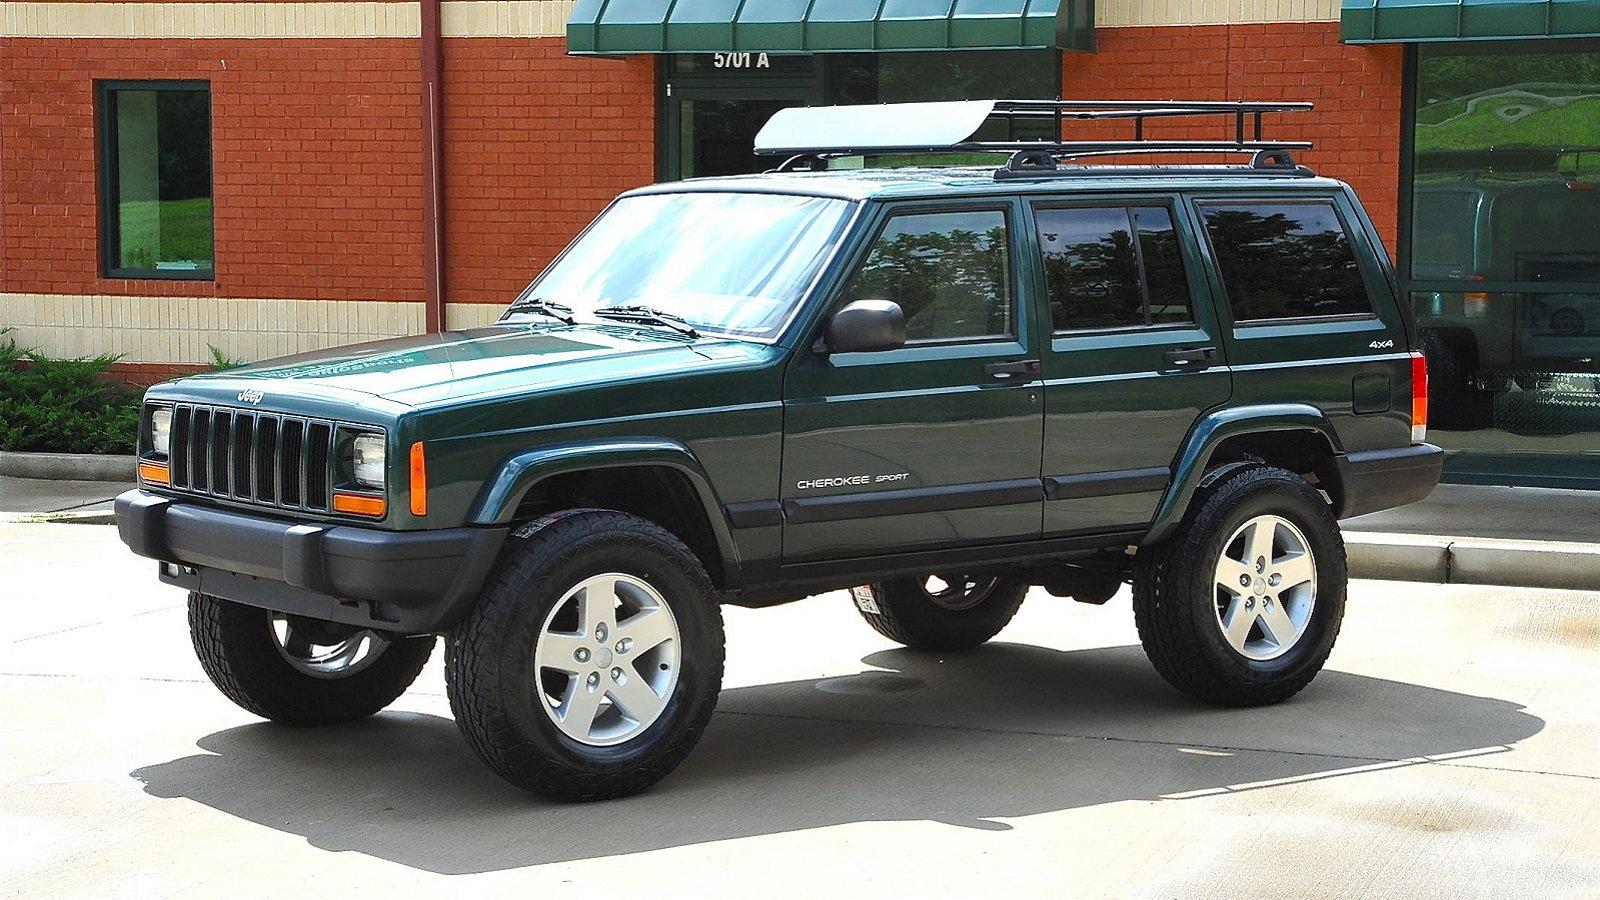 What Made the XJ Cherokee Legendary